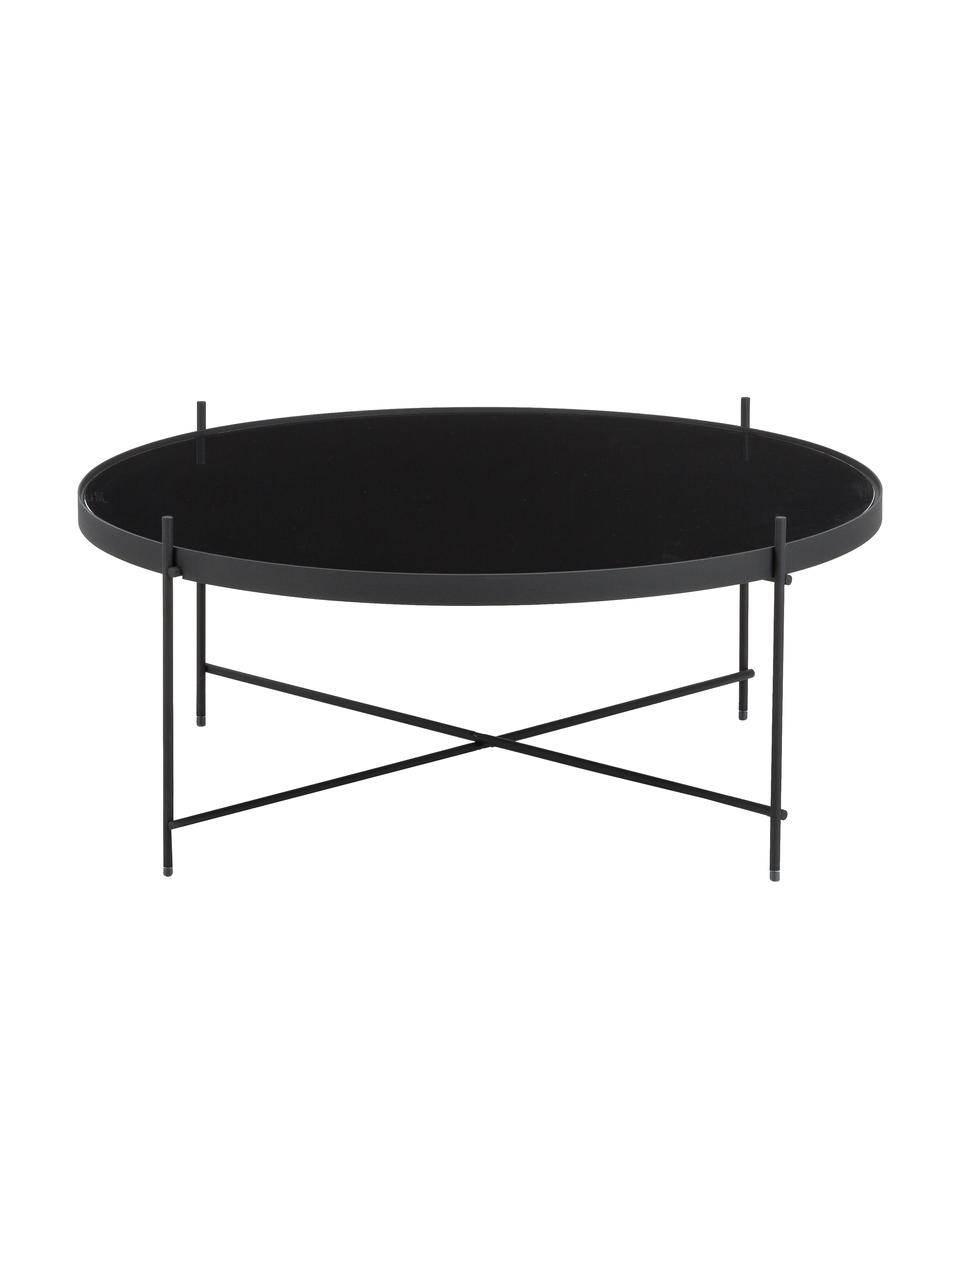 Ronde salontafel Cupid met glazen tafelblad, Frame: gepoedercoat ijzer, Tafelblad: zwart glas, Zwart, Ø 83 x H 35 cm